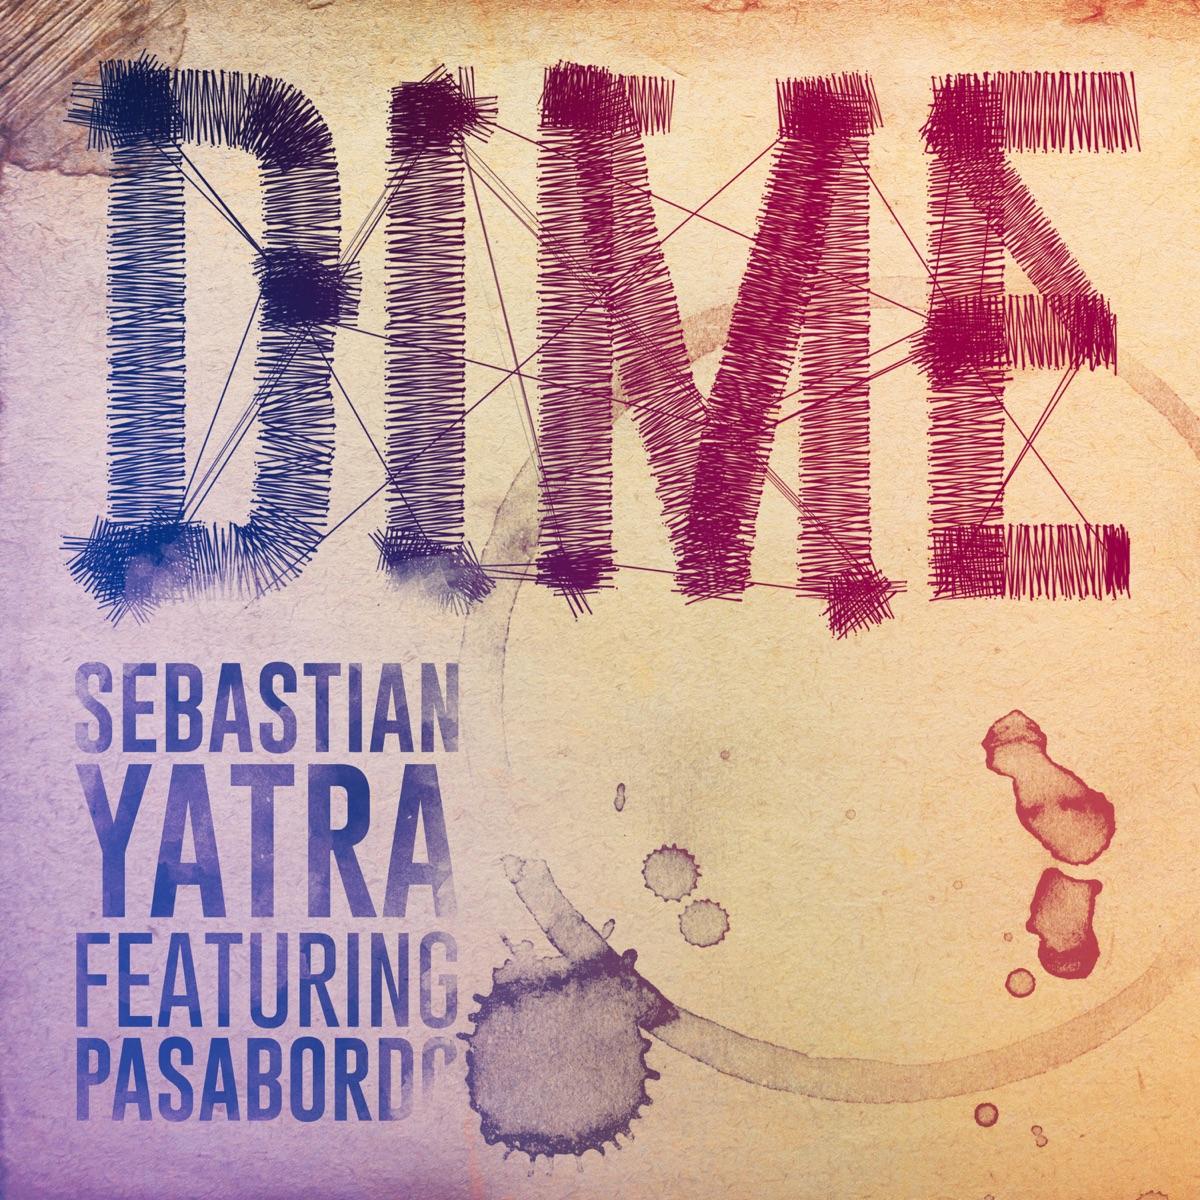 Dime Album Cover by Sebastián Yatra